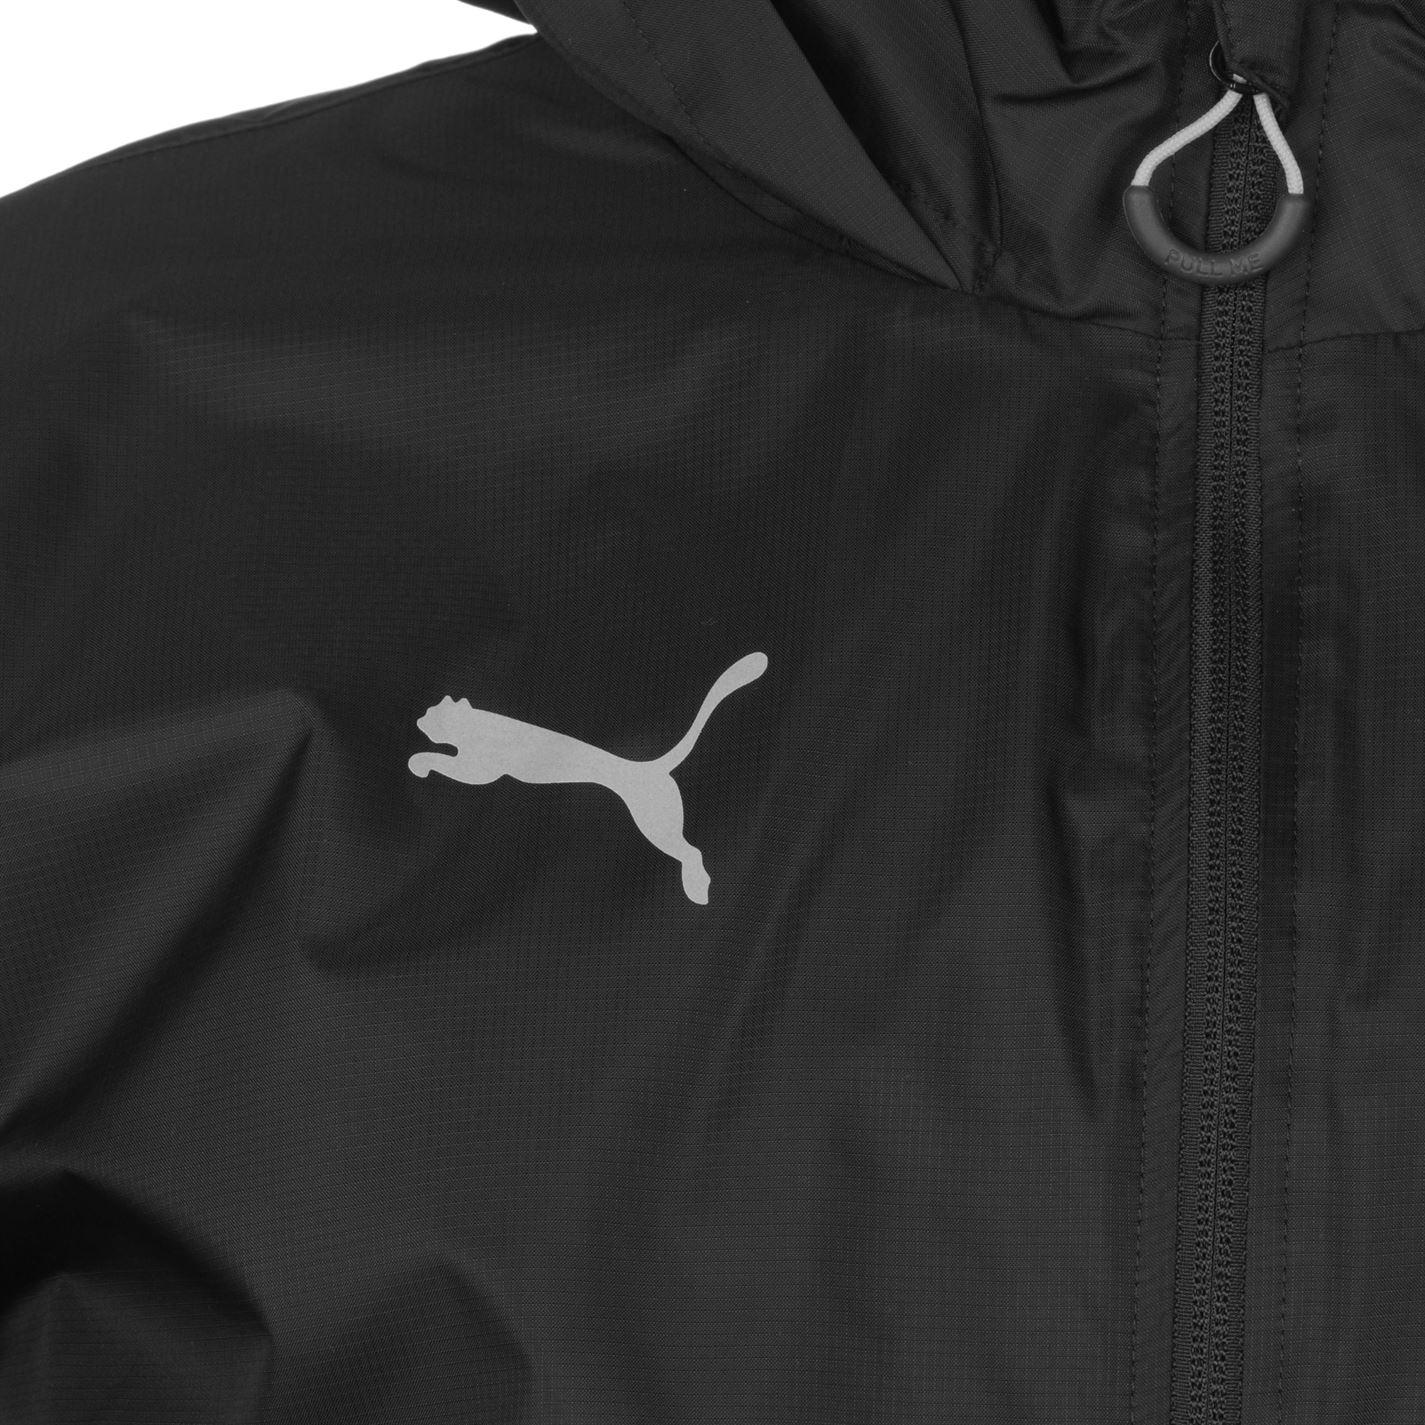 ed455f1e845e Puma Mens Essential Rain Jacket Coat Top Breathable Hooded Zip Full ...